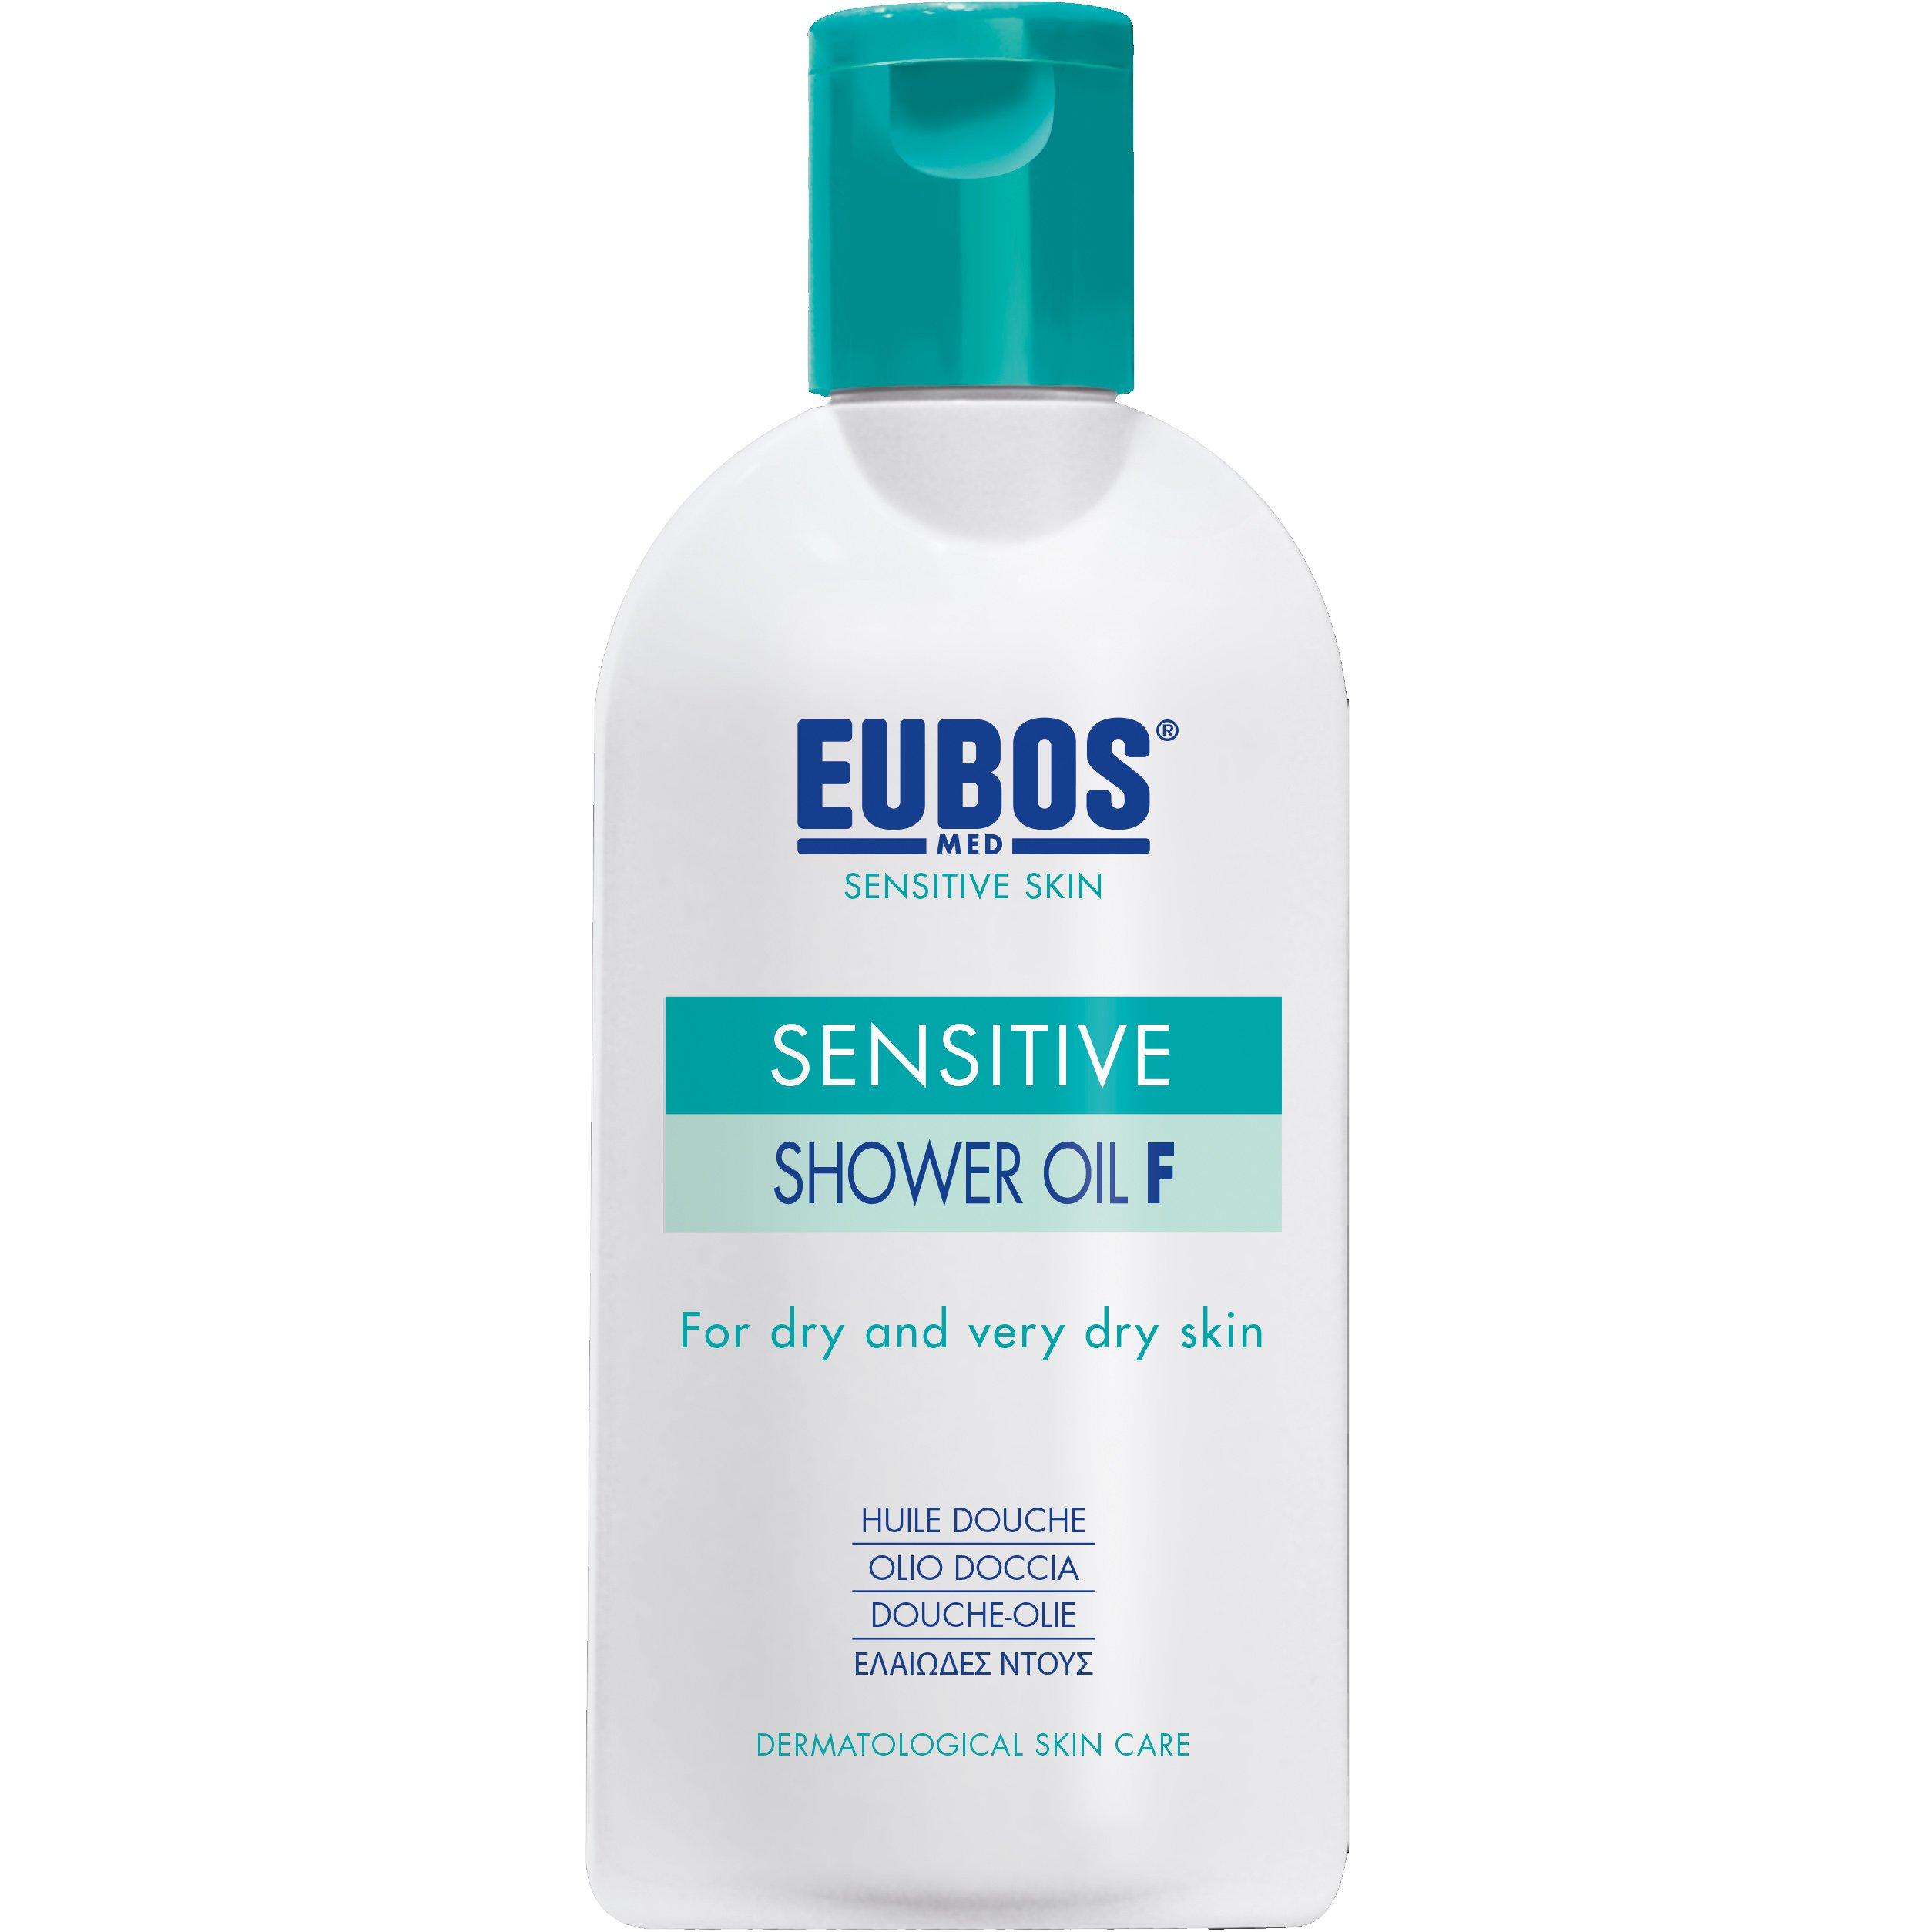 Eubos Sensitive Shower Oil F, Ελαιώδες Ντους για Ξηρό Πολύ Ξηρό Δέρμα 200ml